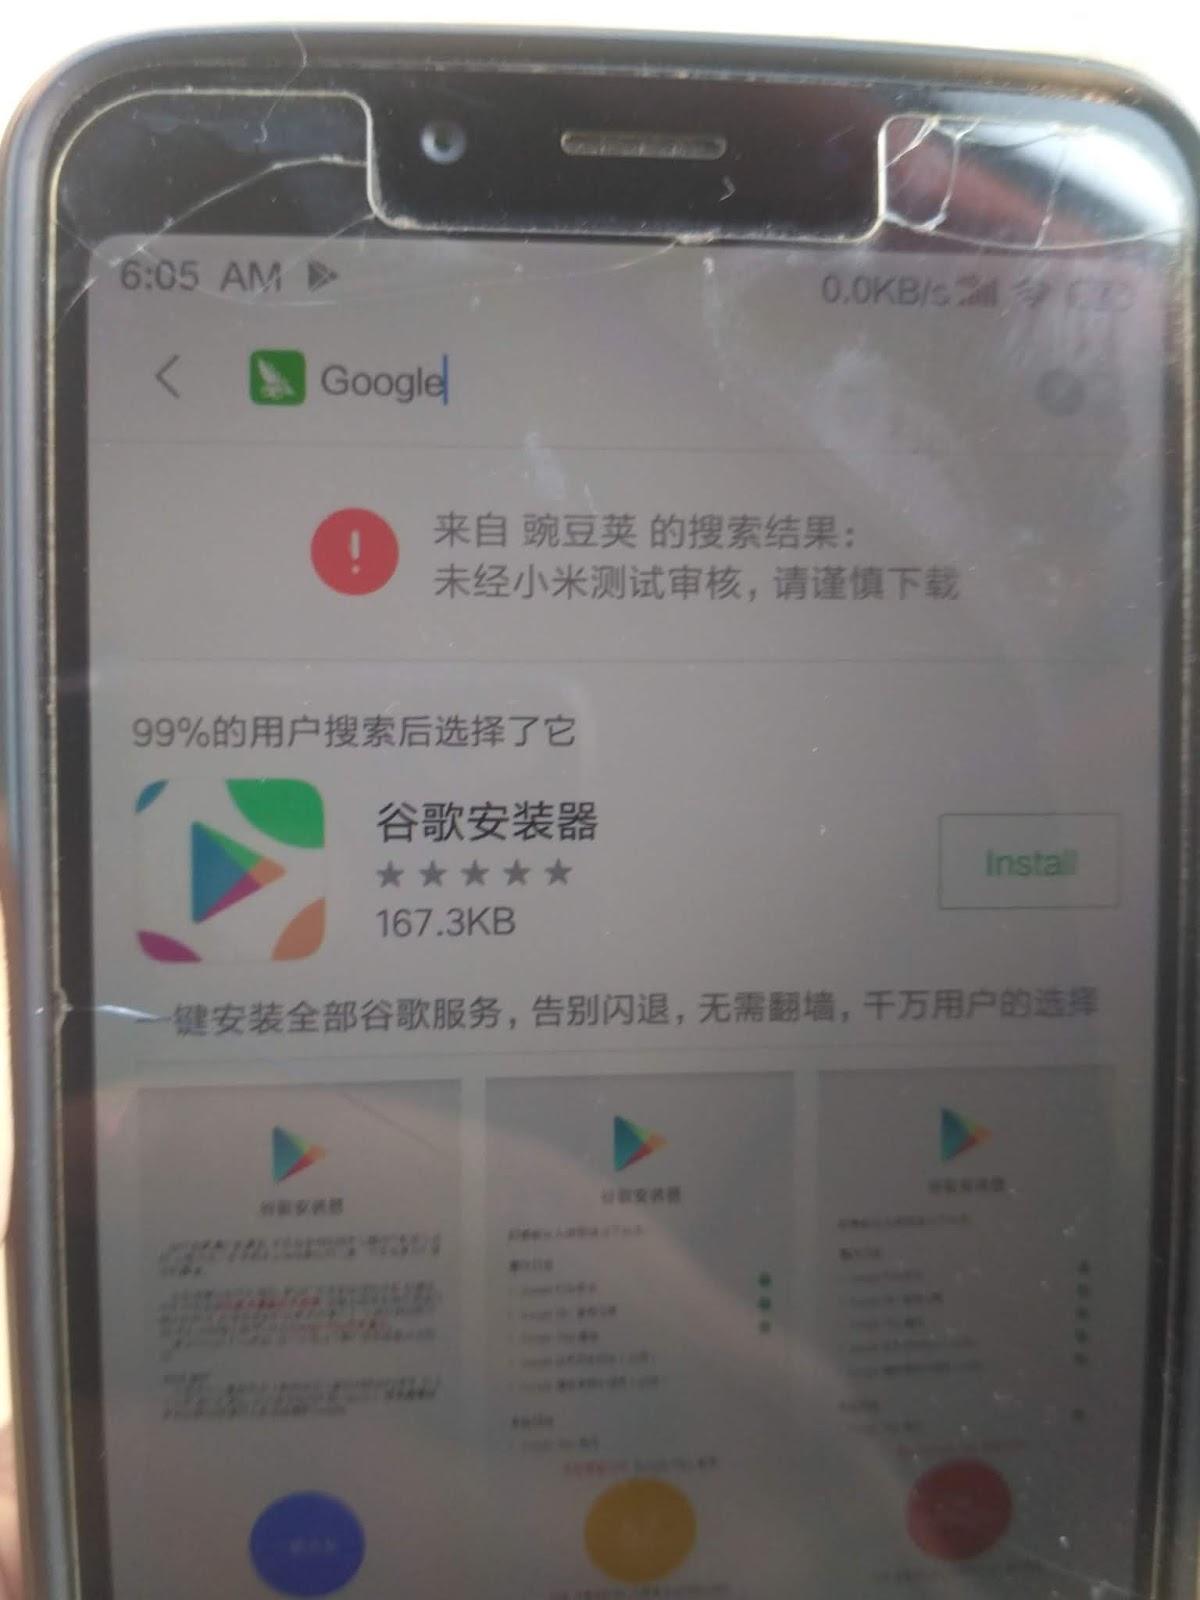 H/M Mobile Repairing Centre: Redmi 6A Google play store